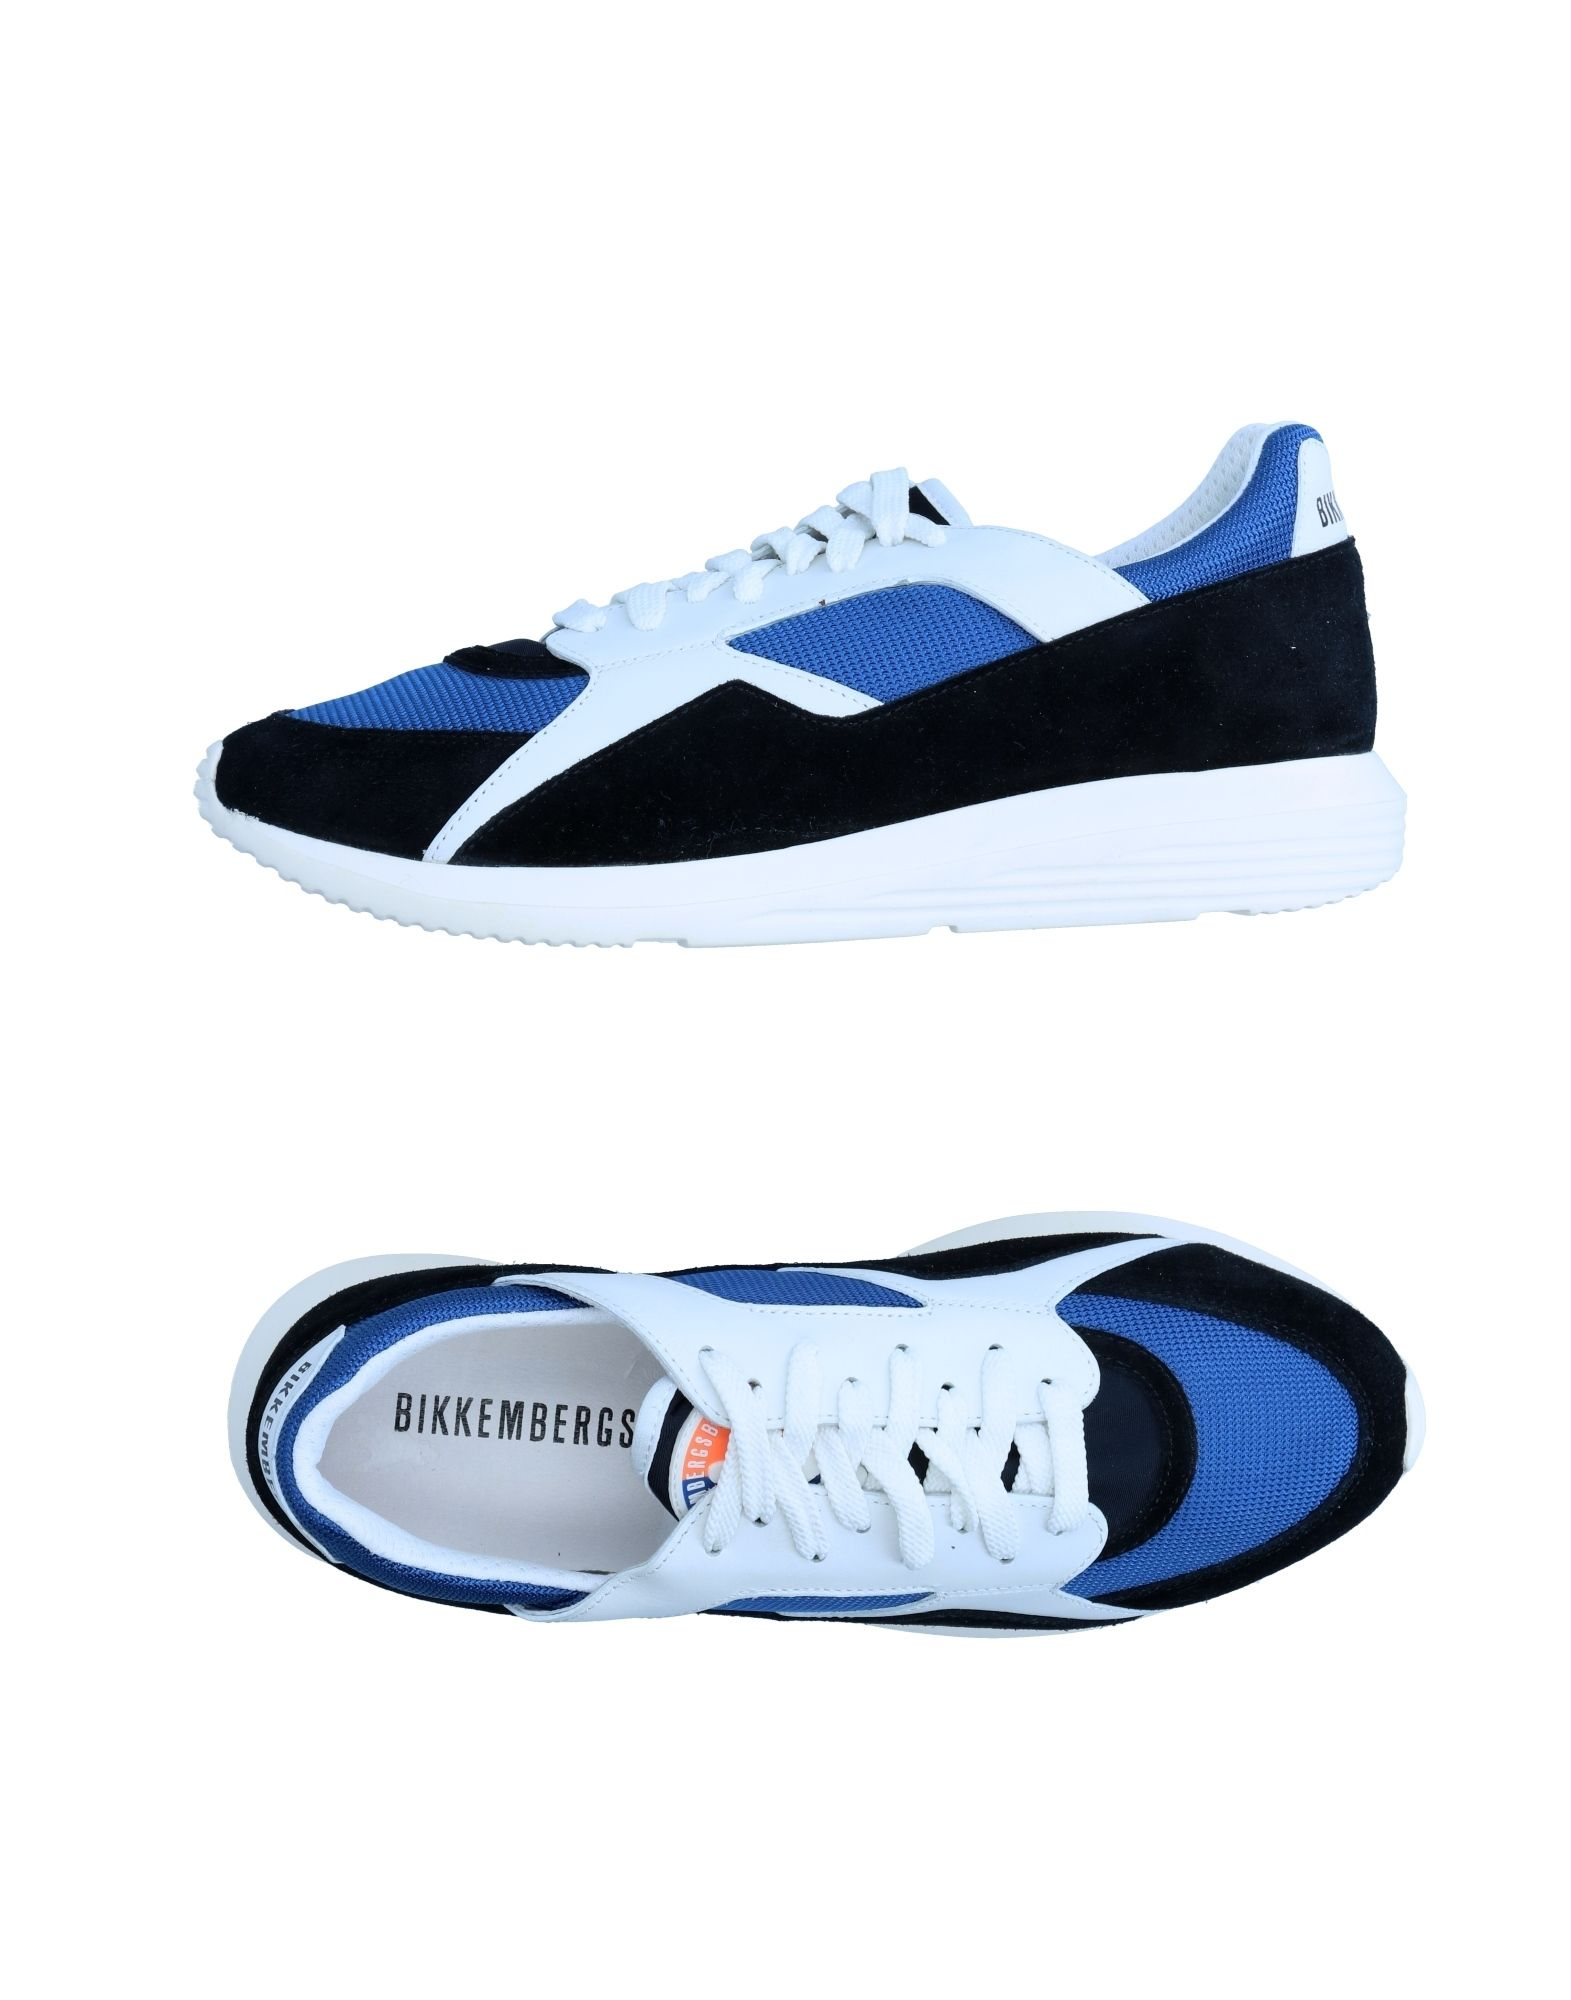 Bikkembergs Sneakers Sneakers Bikkembergs Herren  11232887LO 38f07b